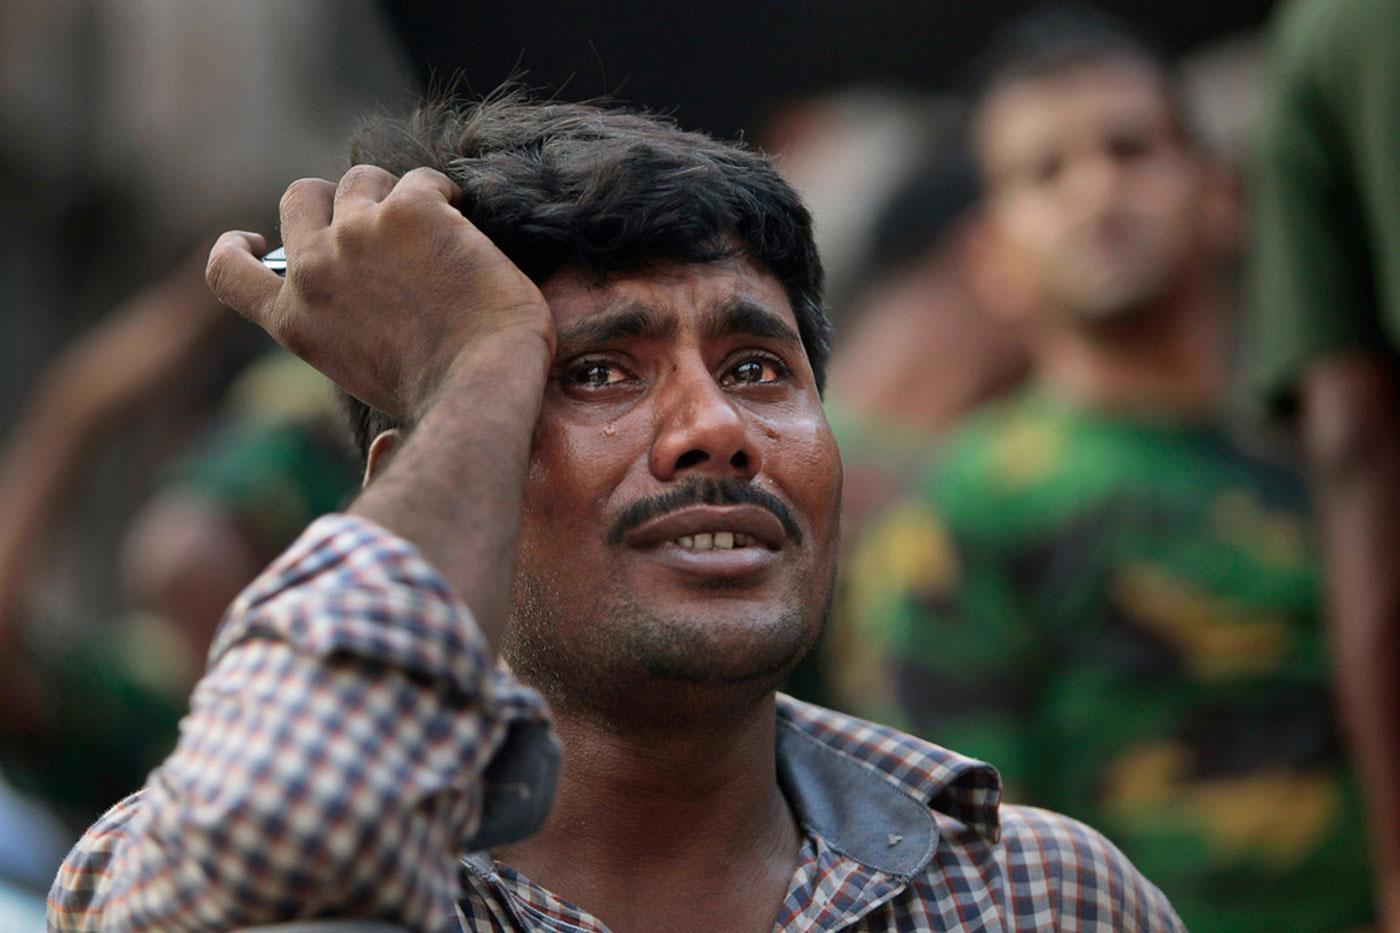 мужчина плачет на месте трагедии